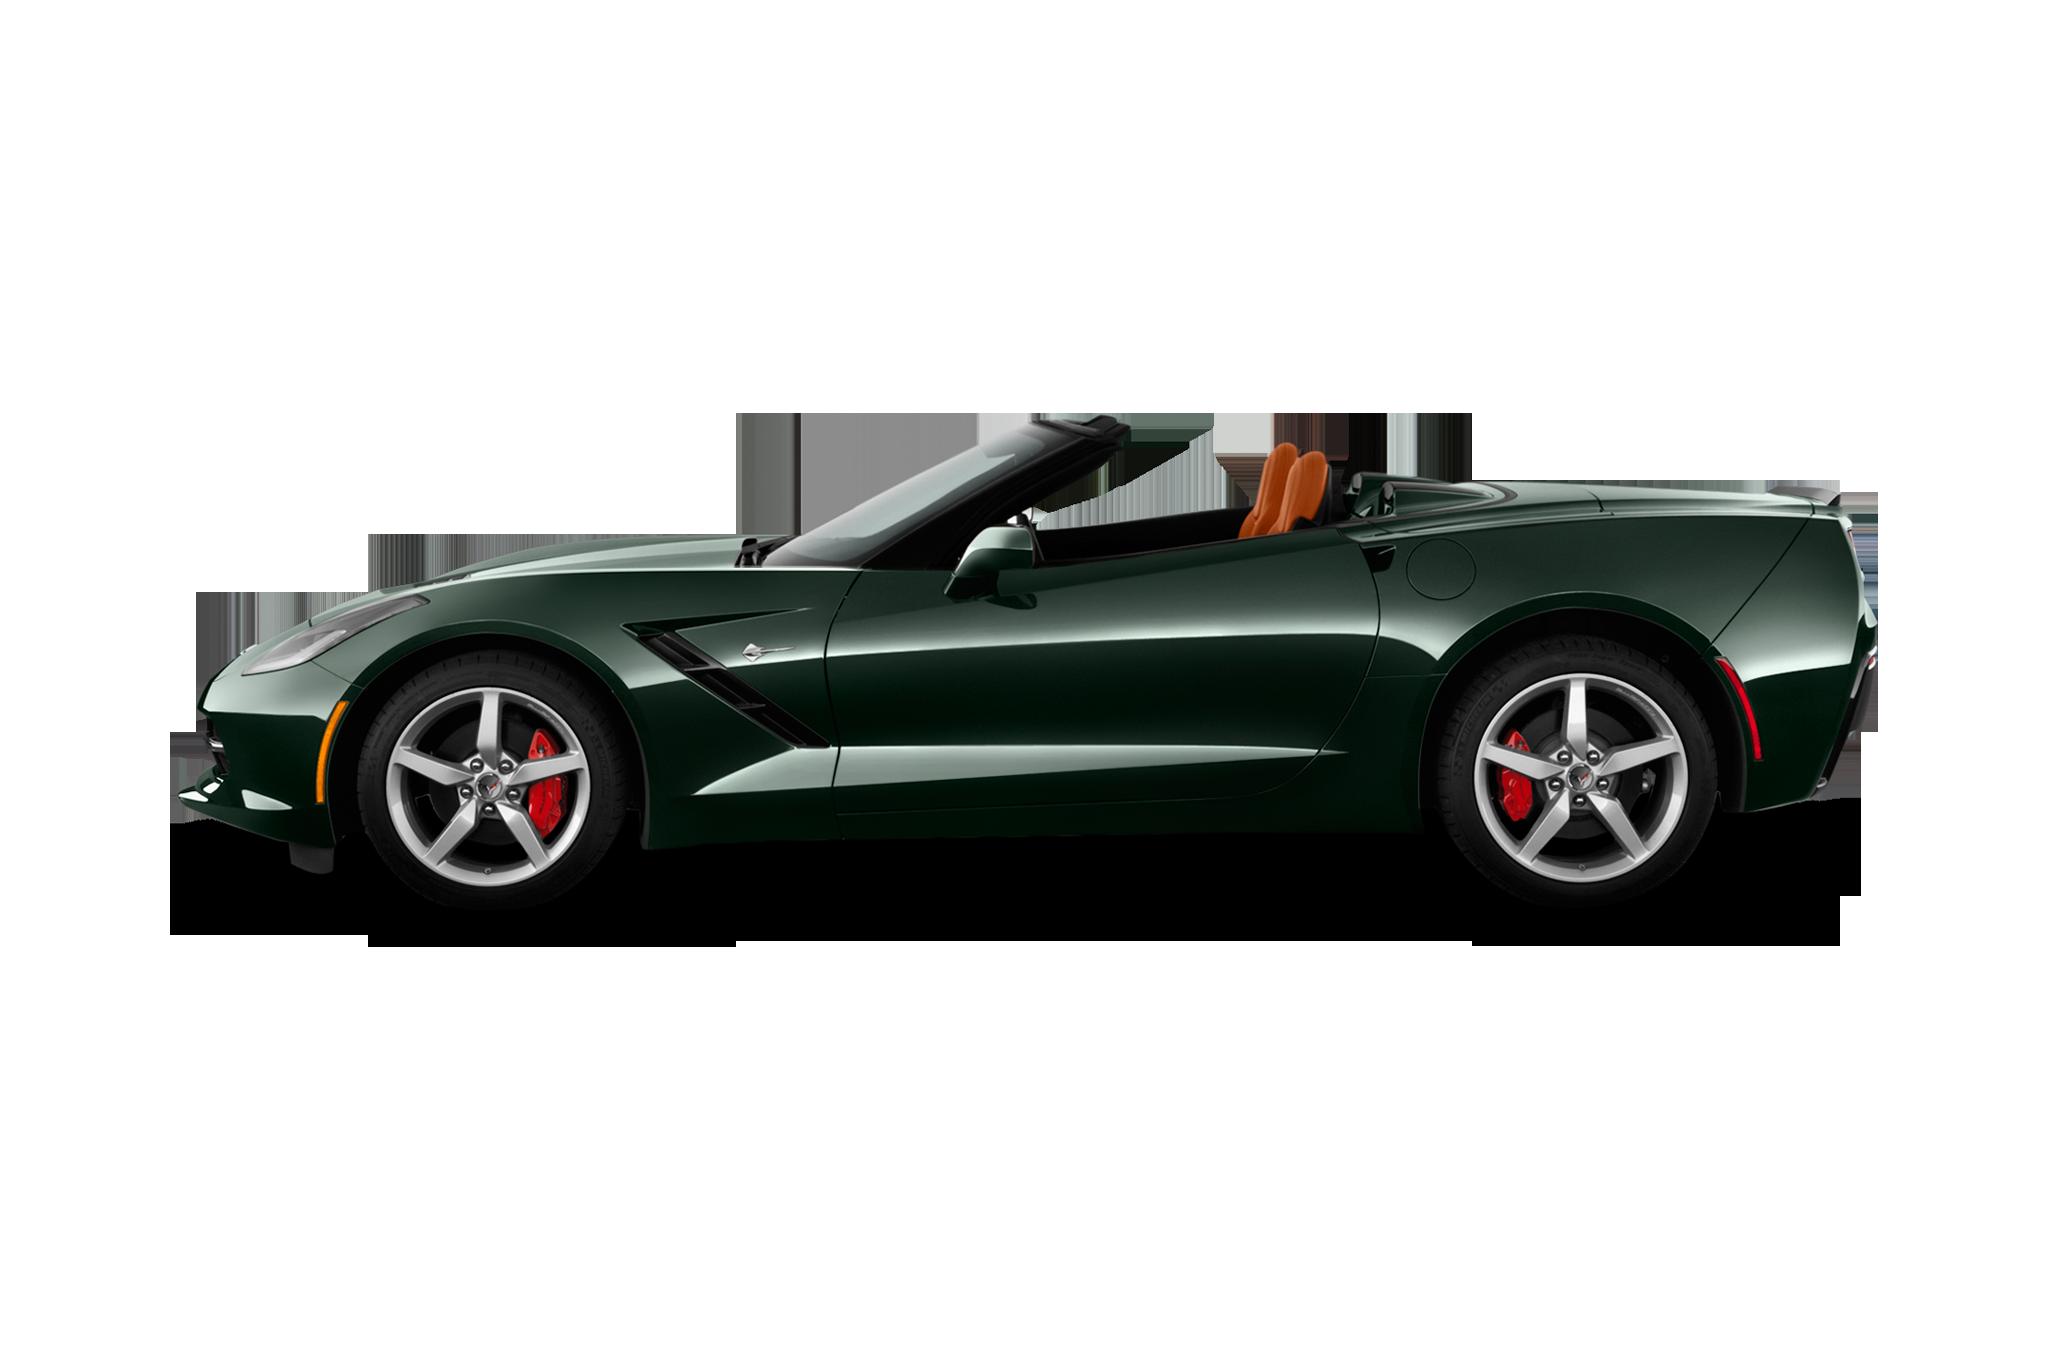 Engine clipart side view. Chevrolet corvette png image